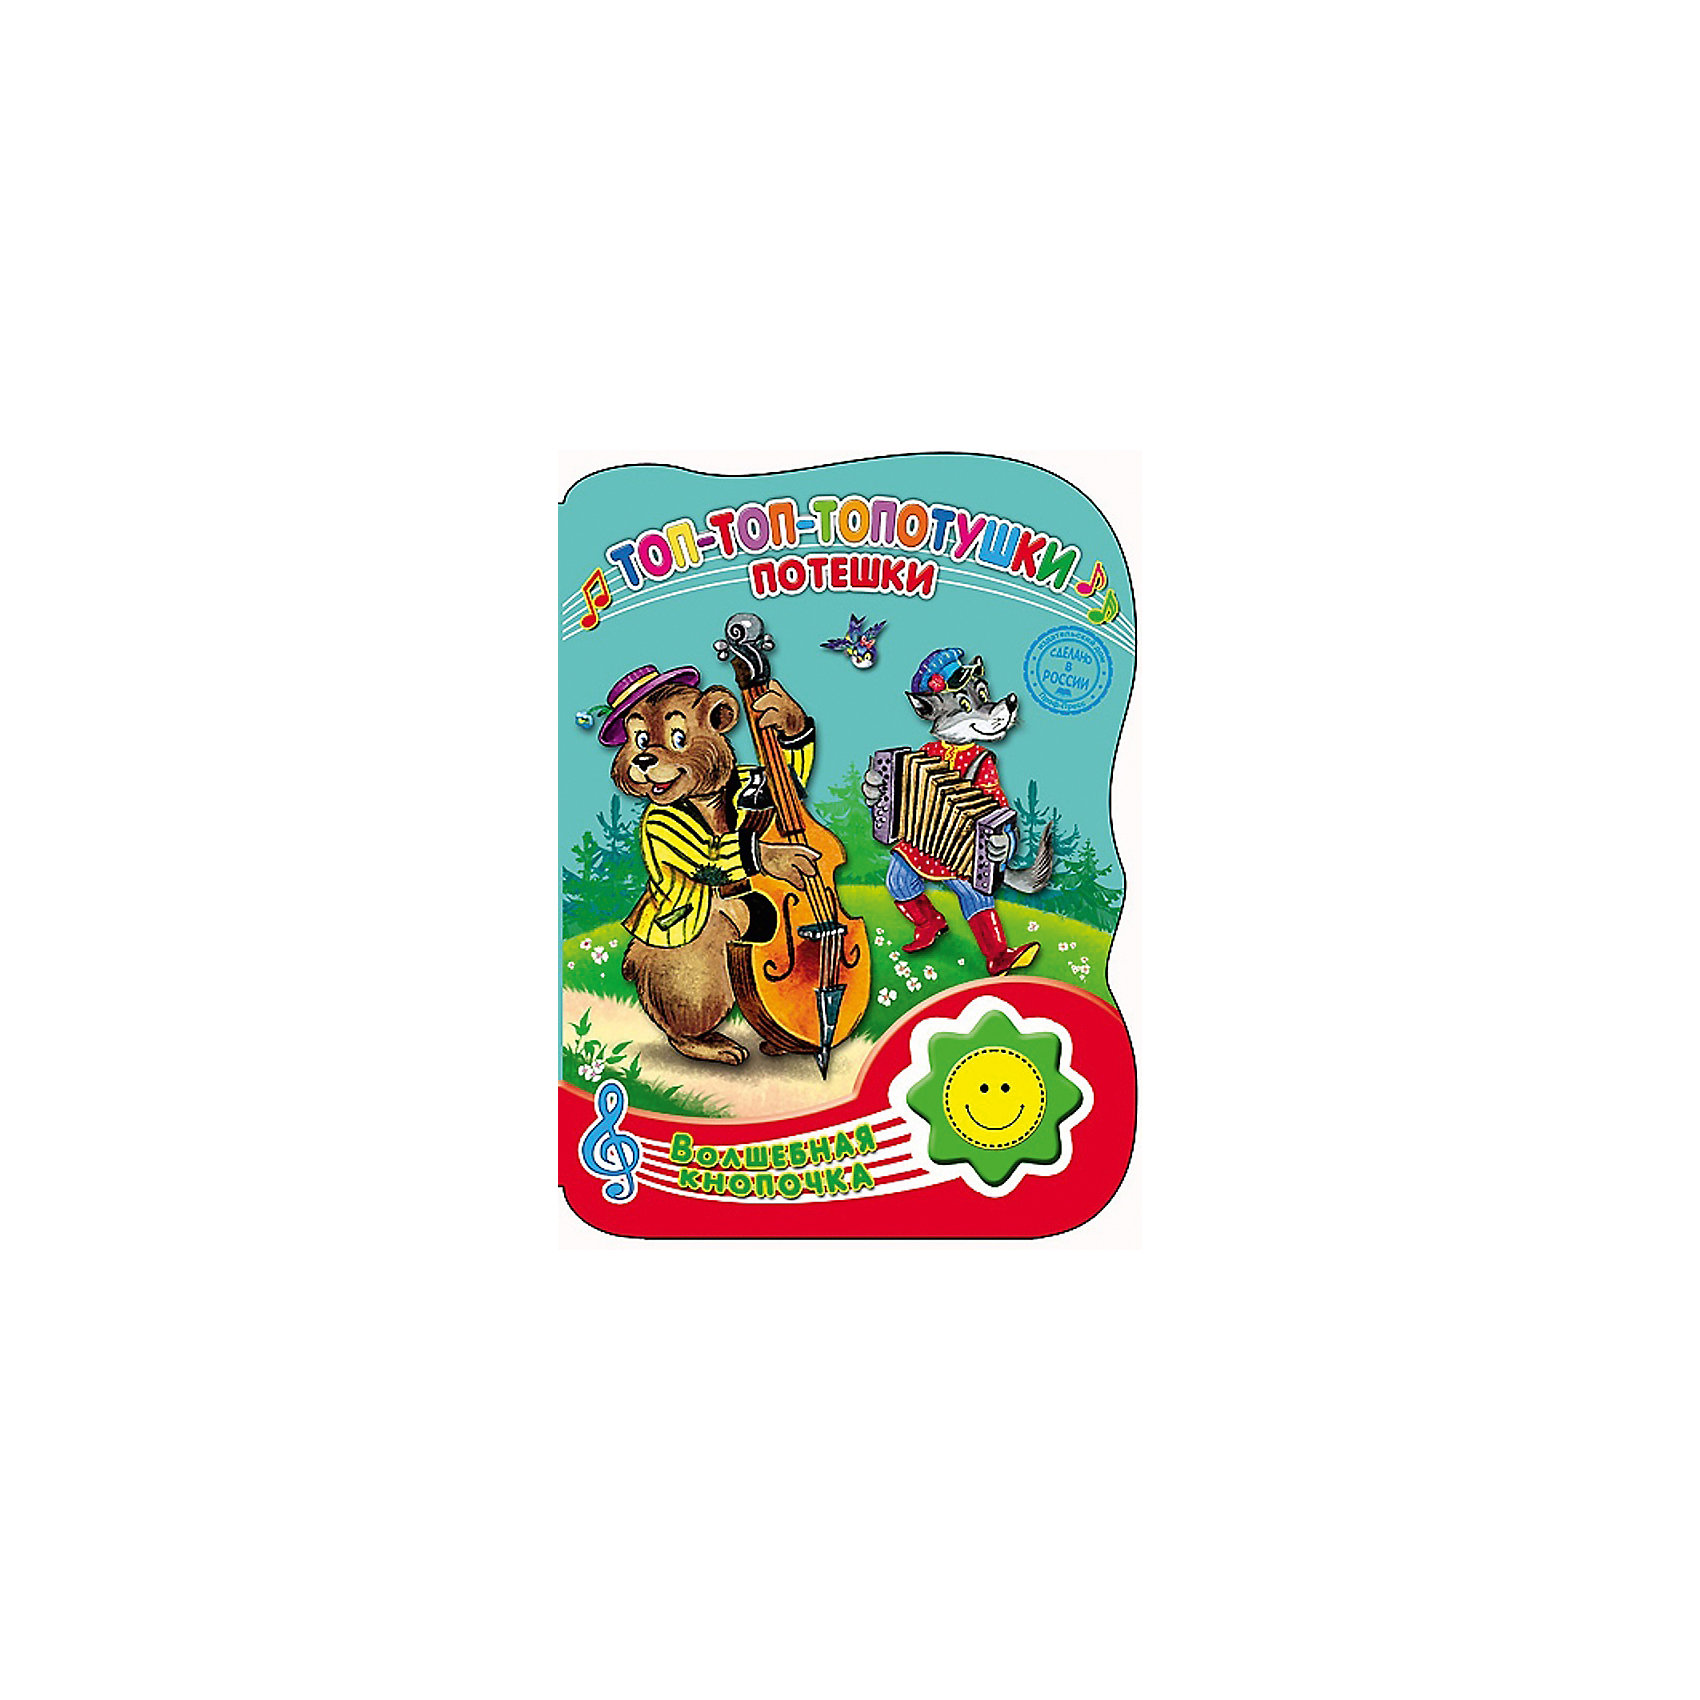 Проф-Пресс Топ-топ-топотушки, Волшебная кнопочка книги проф пресс волшебная кнопочка ладушки ладушки потешки